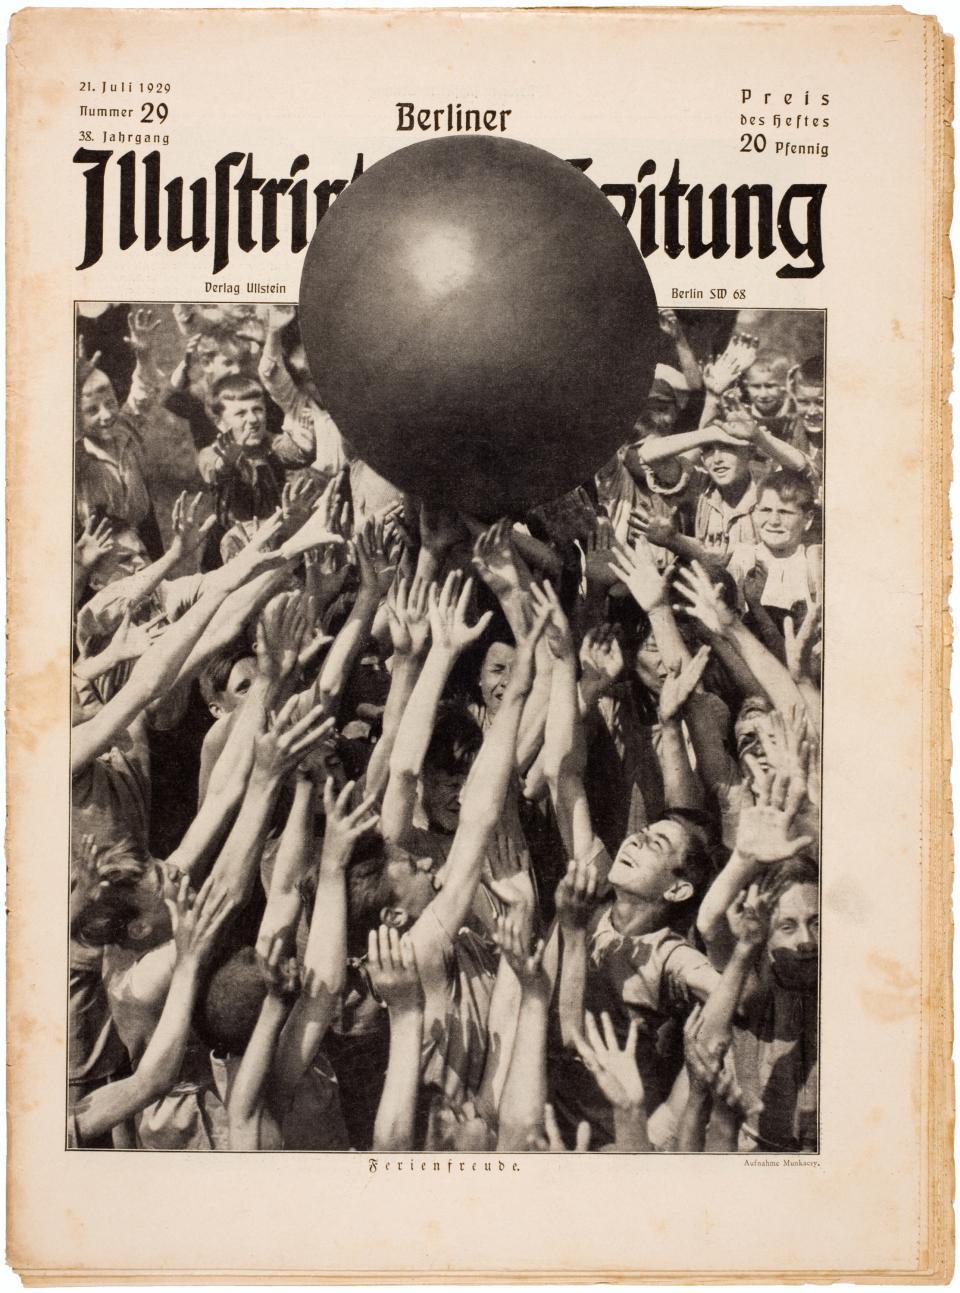 Berliner Illustrirte Zeitung, July 21, 1929, cover photograph by Martin Munkasci. Courtesy International Center of Photography